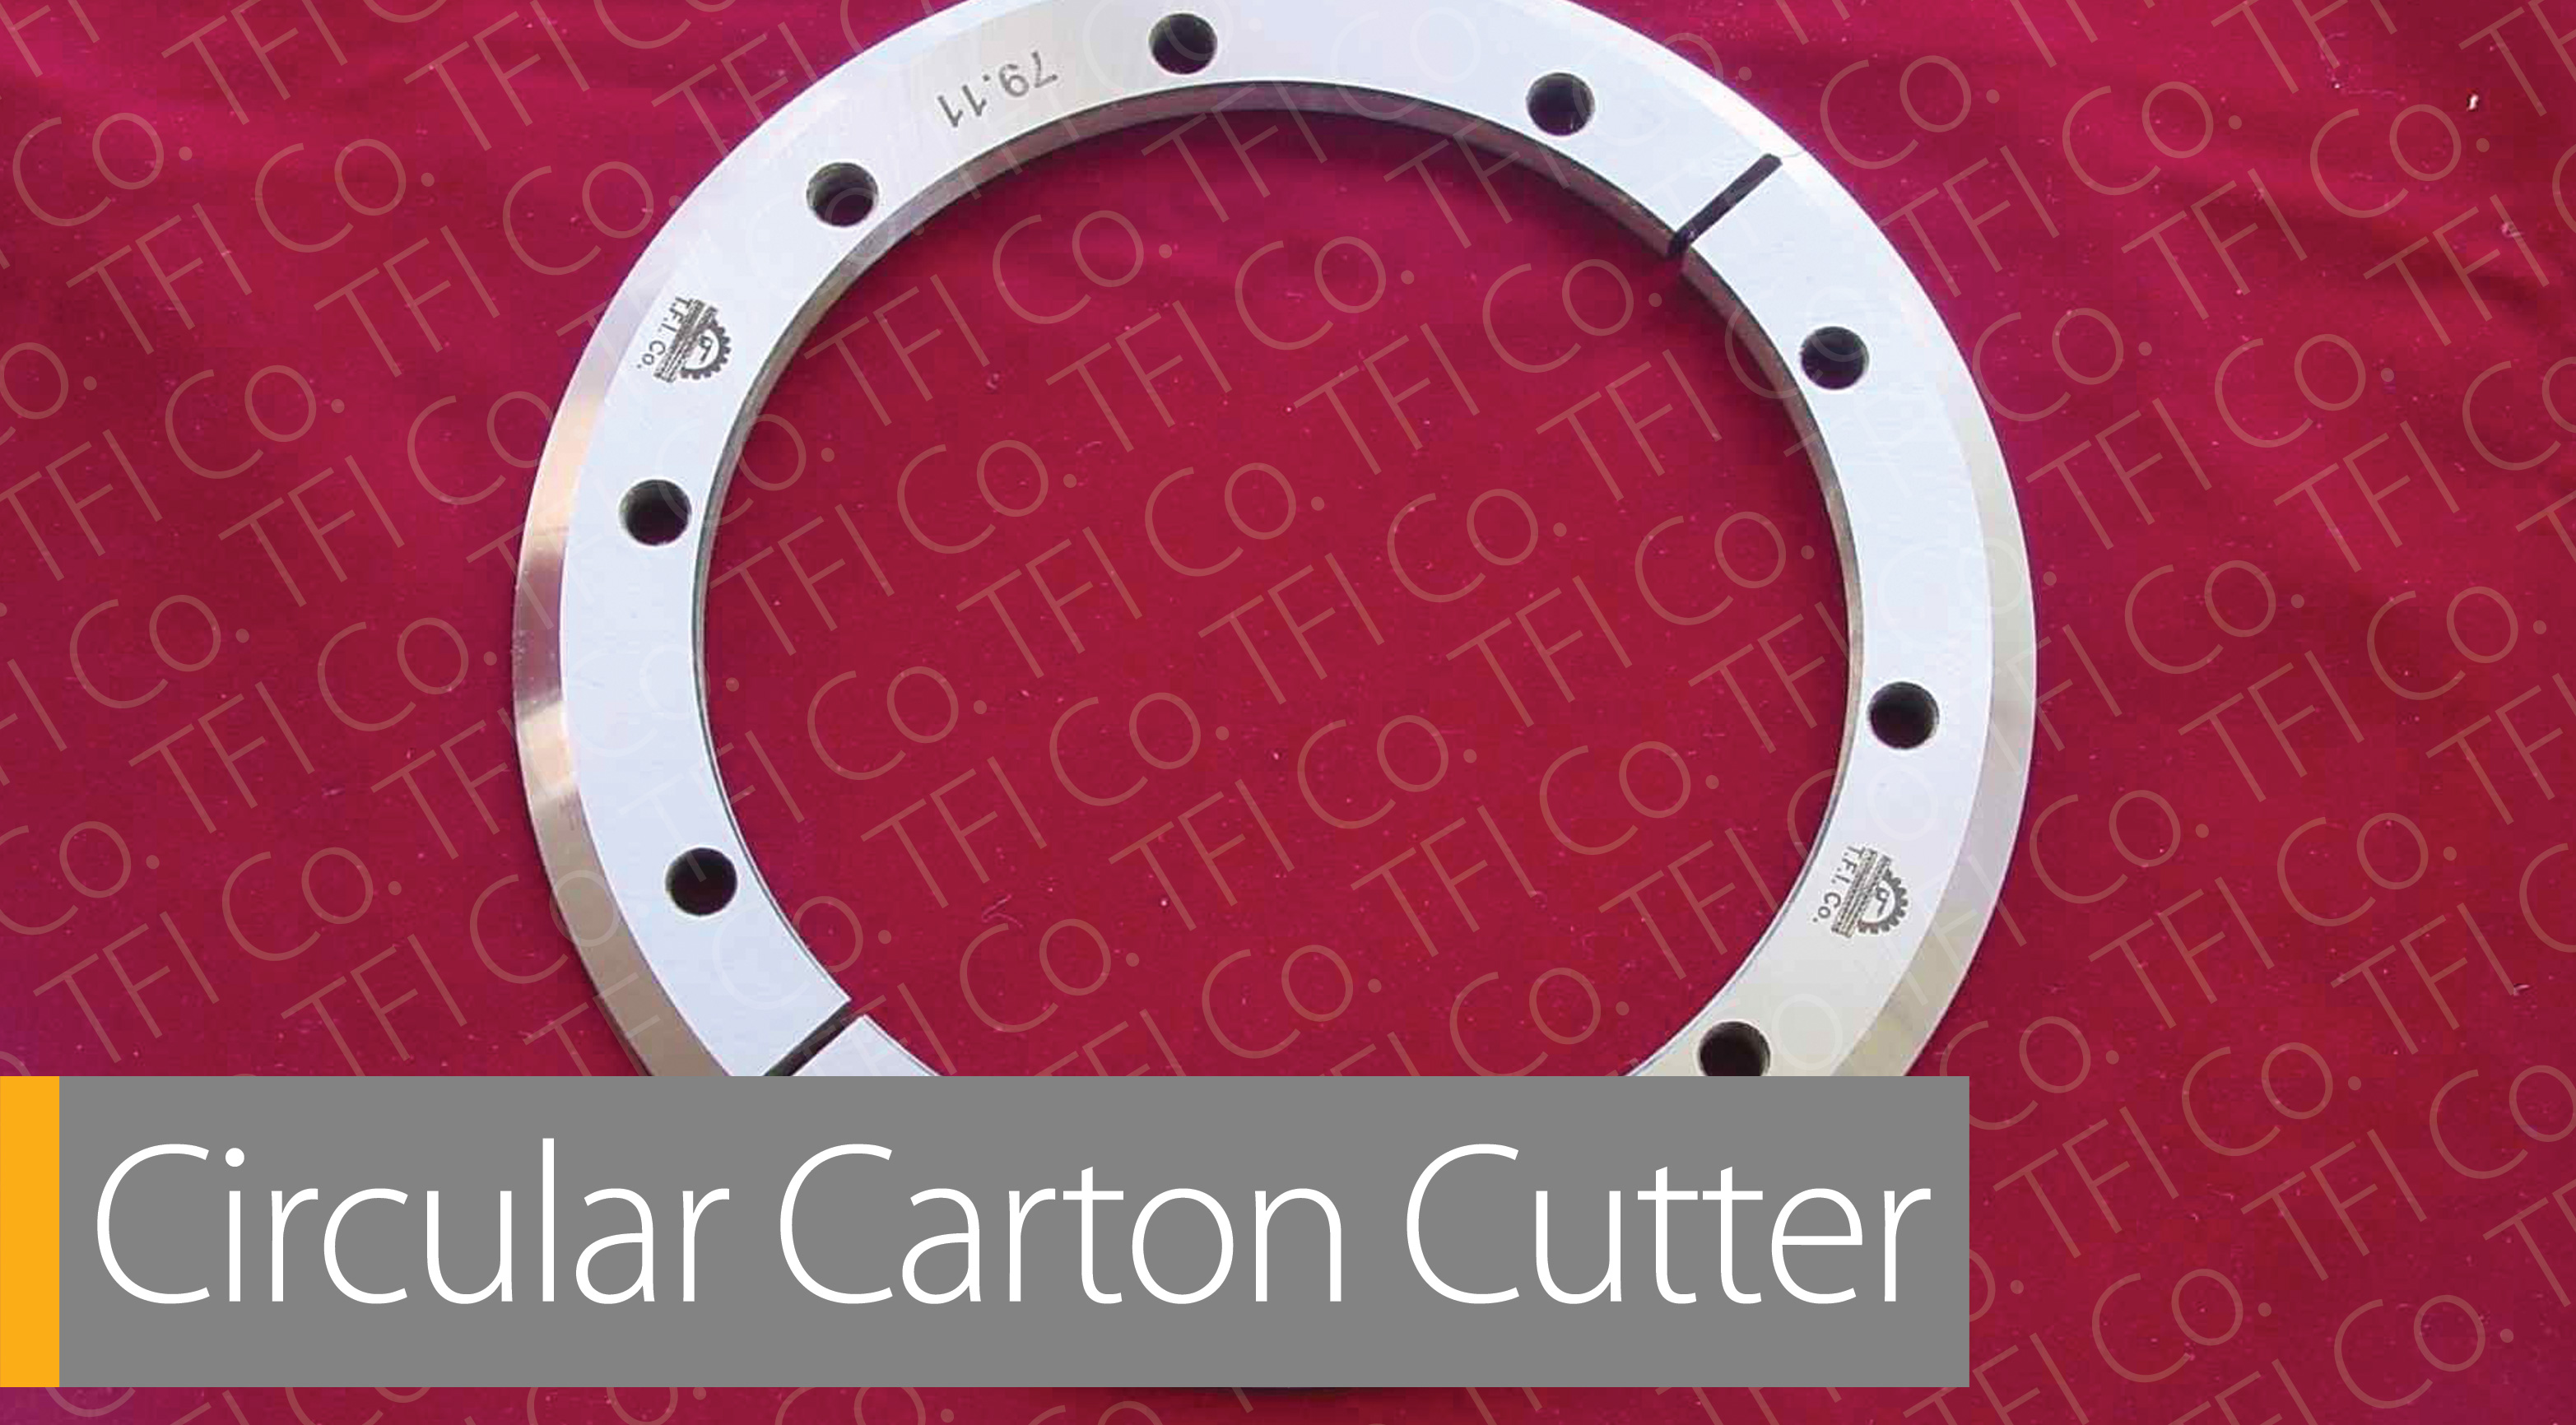 Circular Carton Cutter